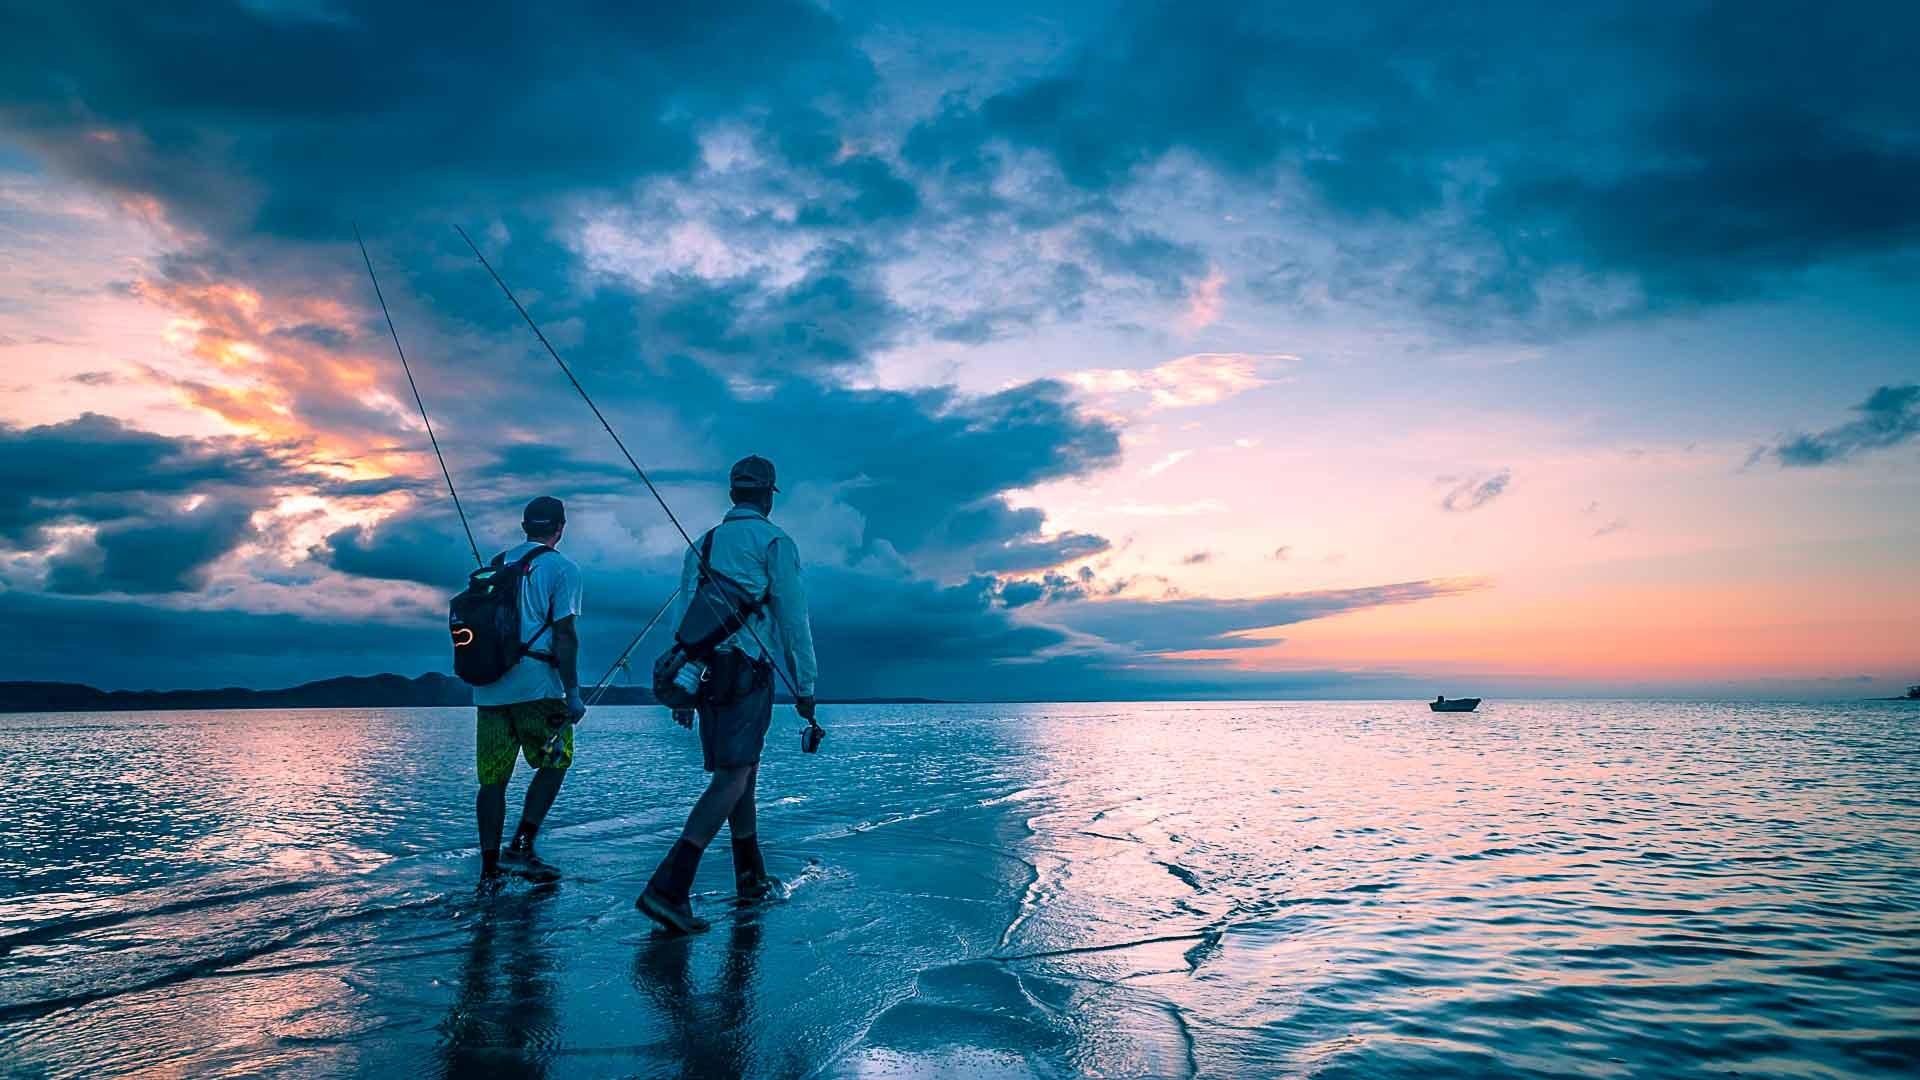 Deep Sea Fishing Wallpaper 68 Images